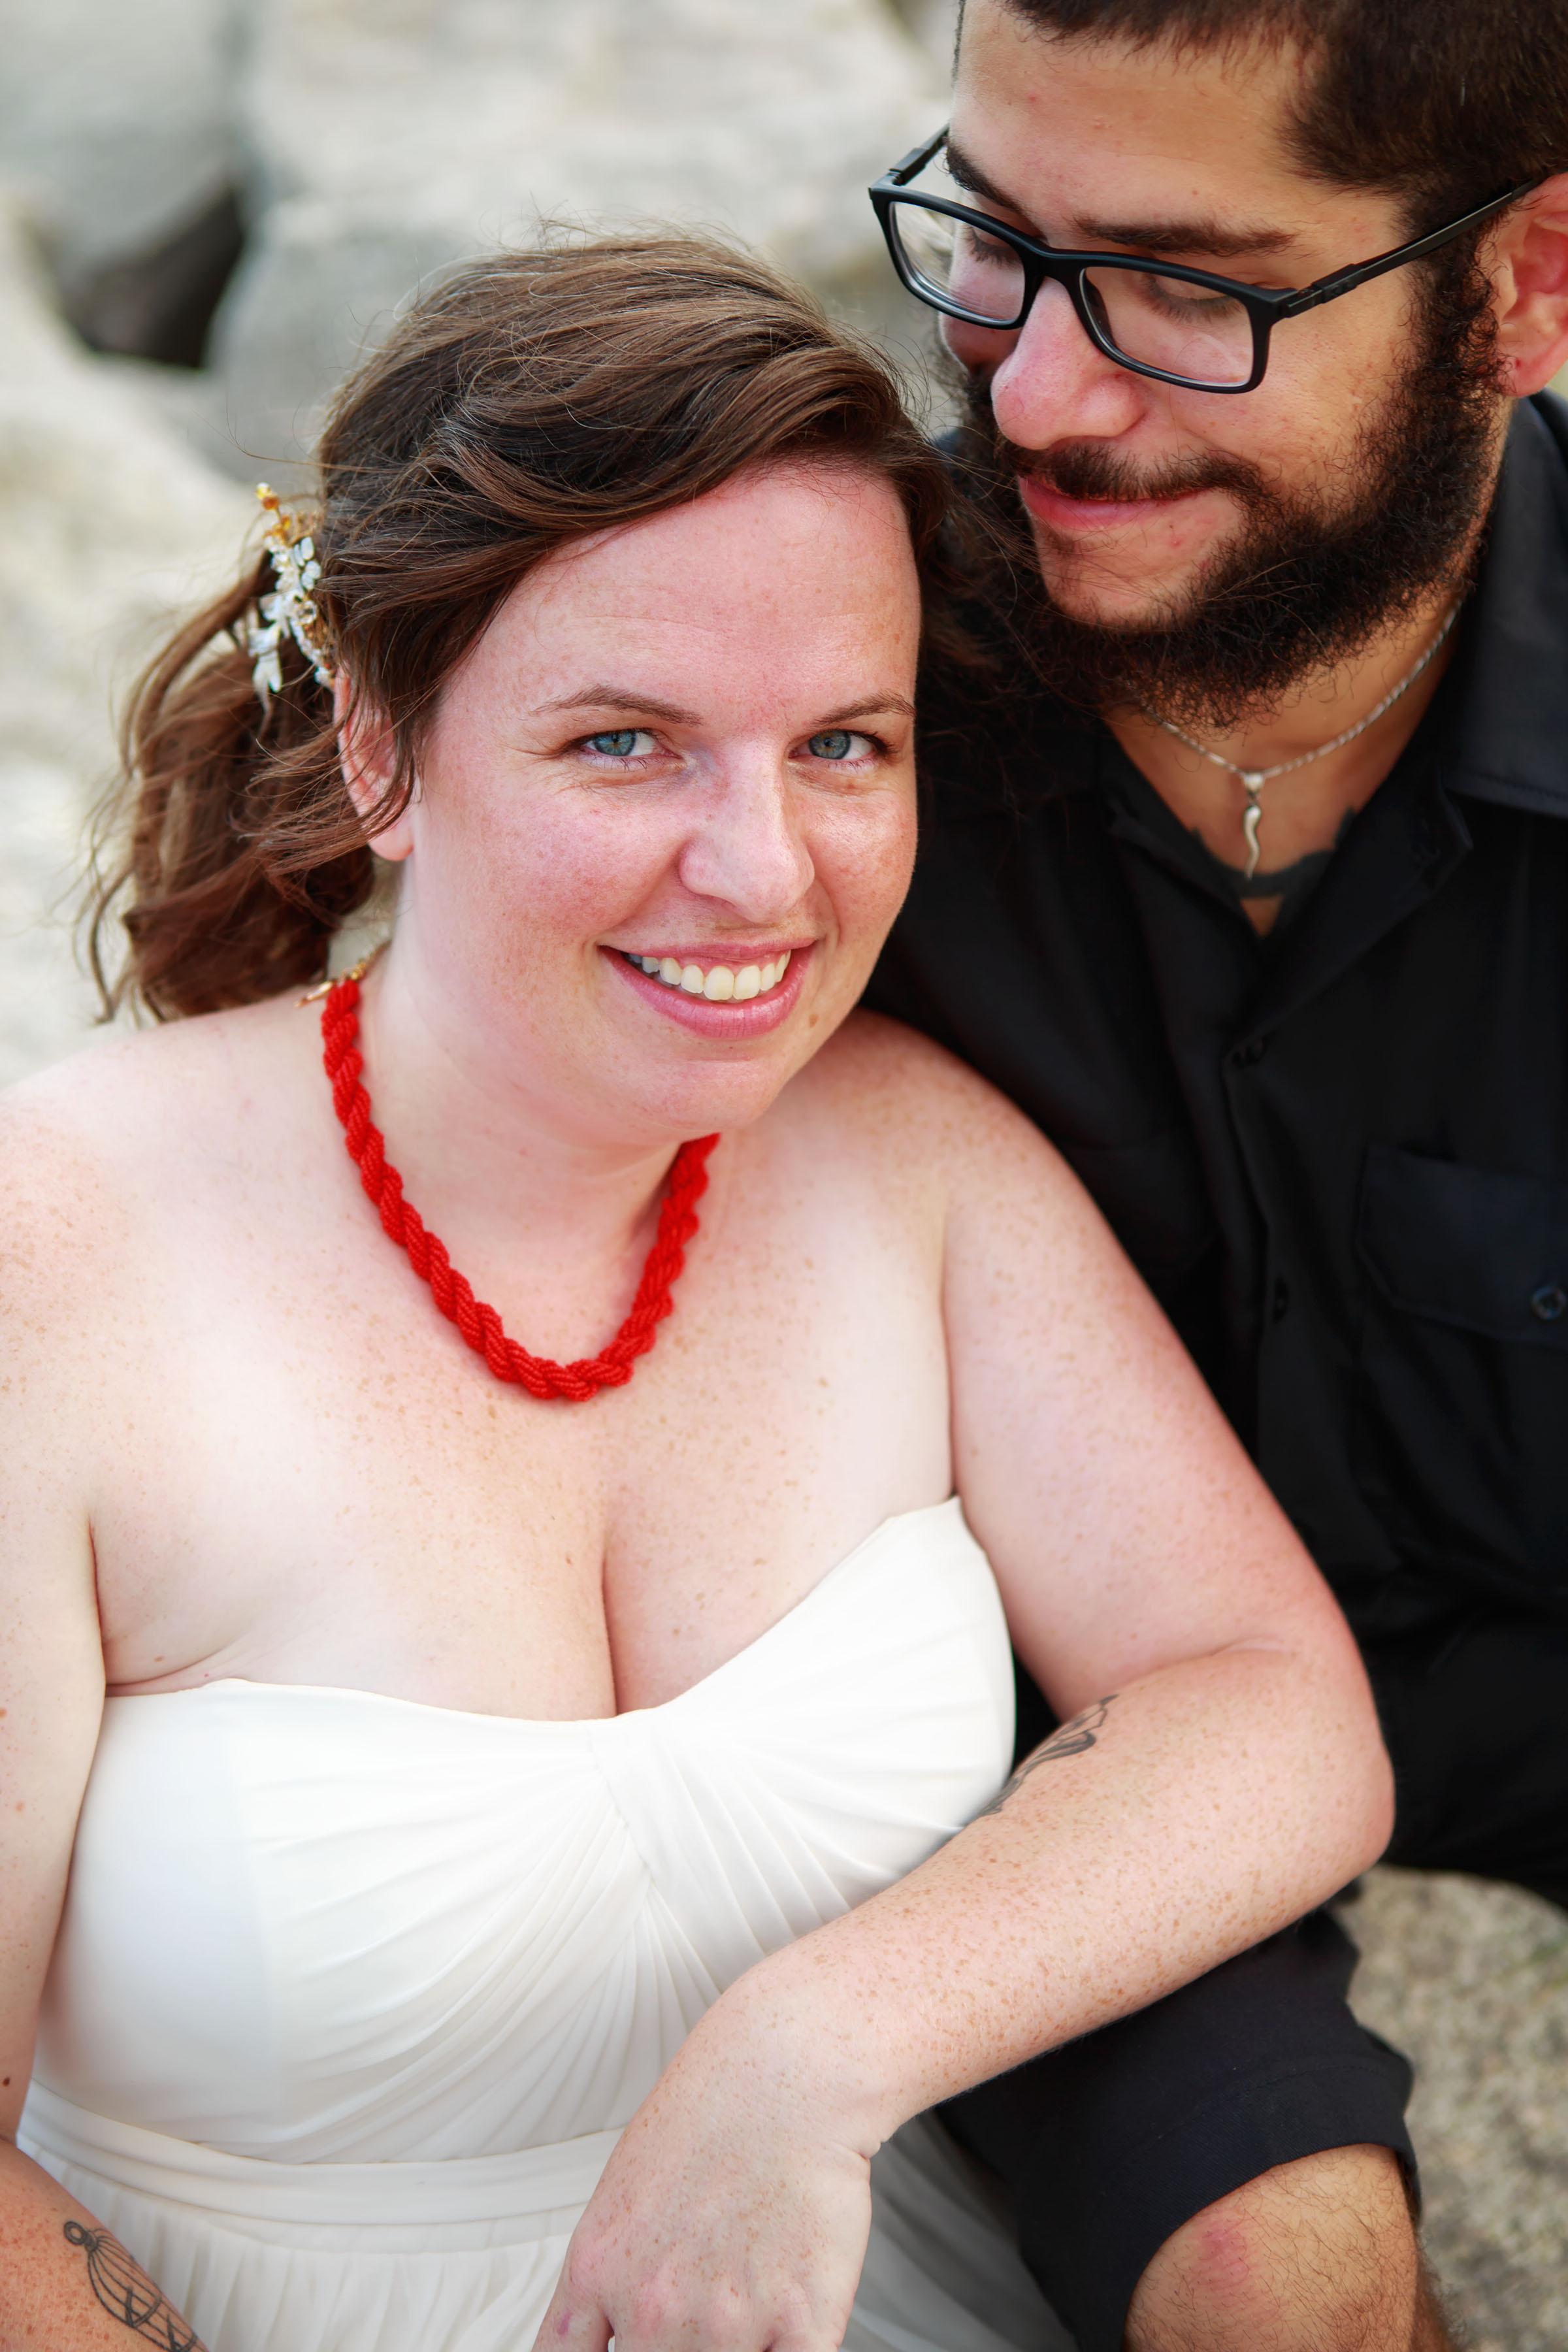 Fort_Fisher_Wedding_Photographer_Tiffany_Abruzzo_97.jpg